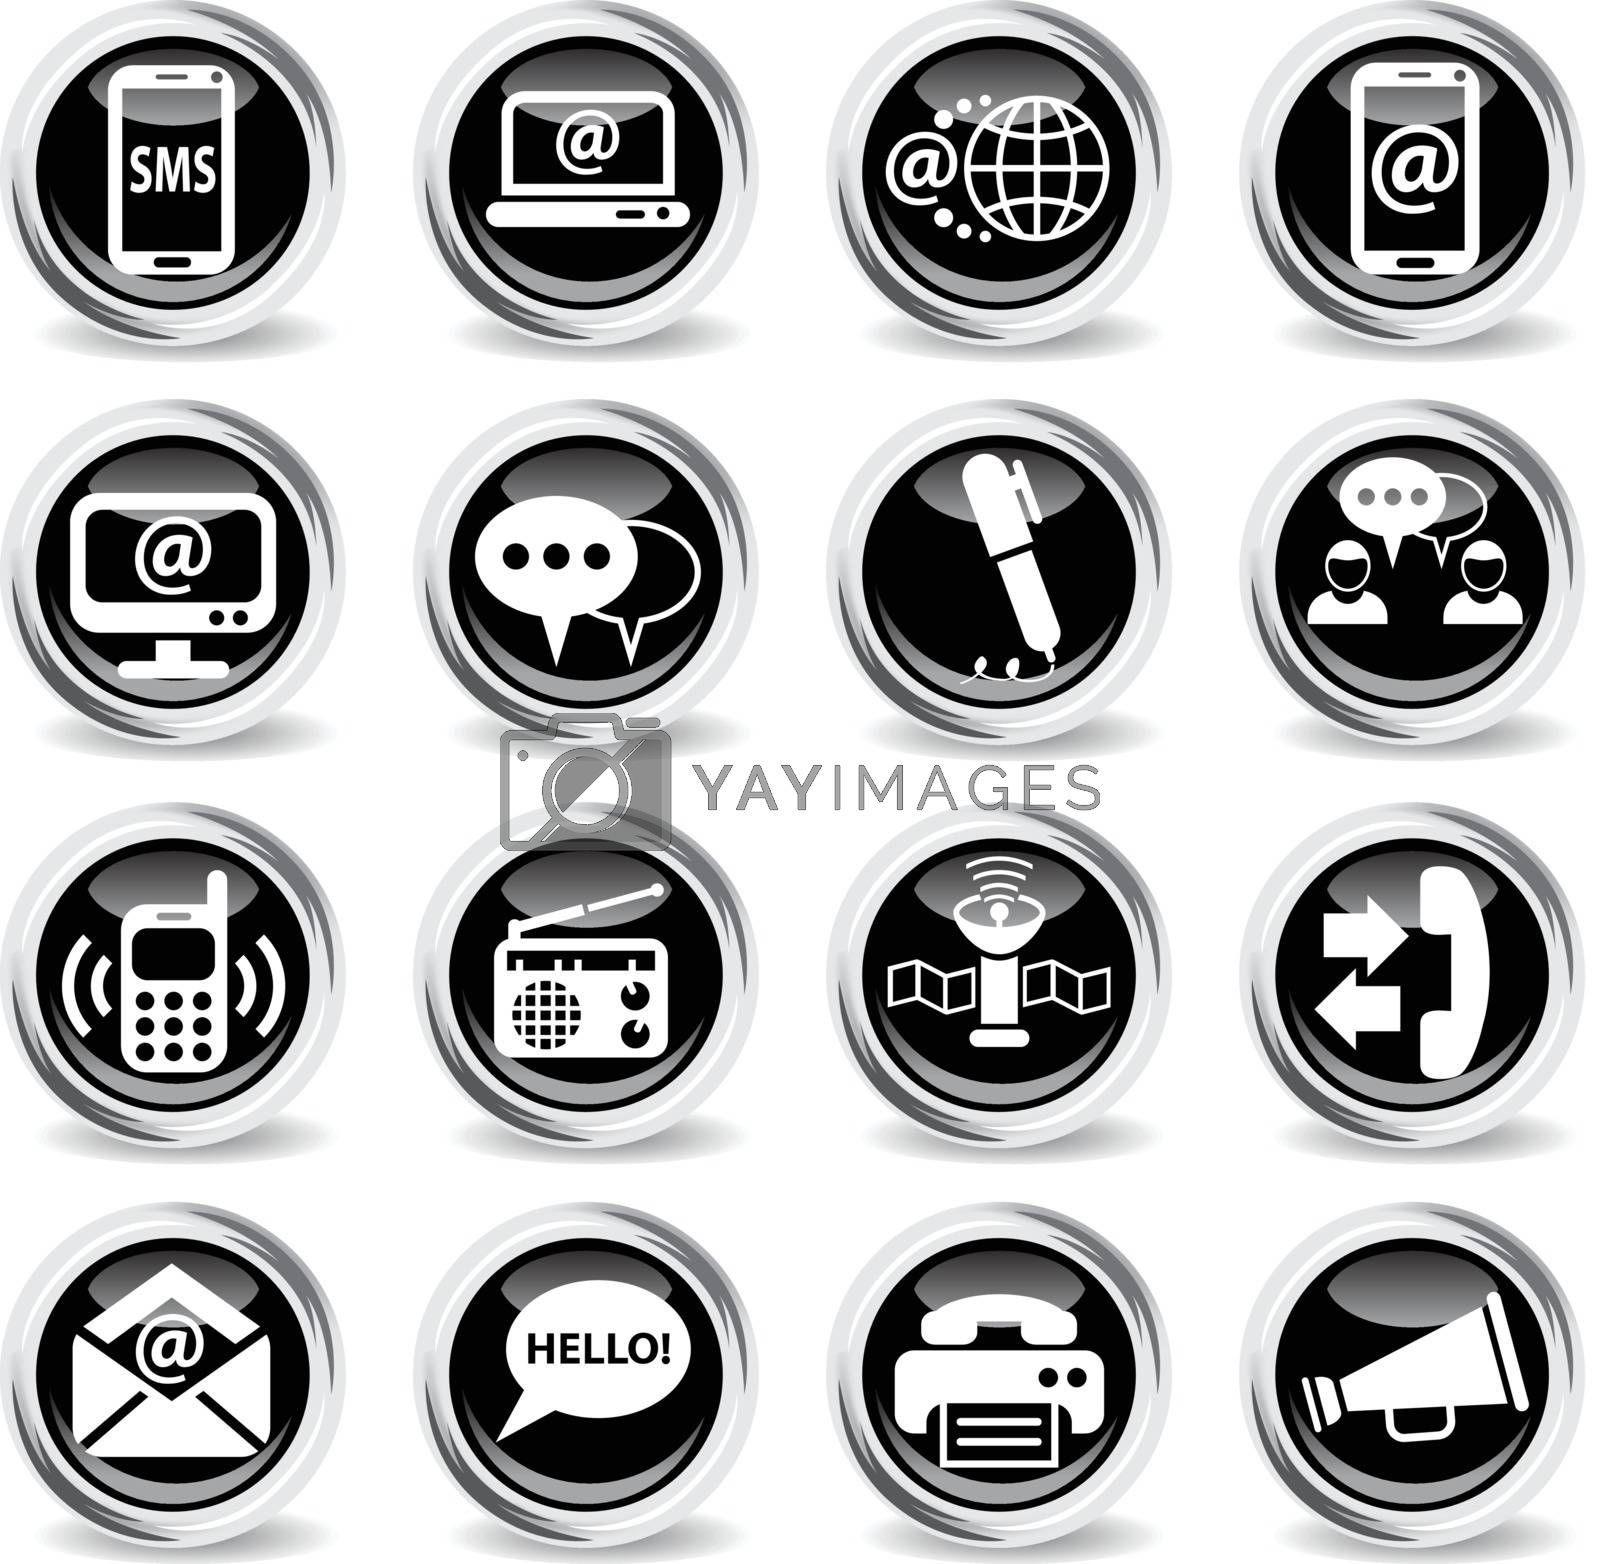 communication icons on stylish round chromed buttons